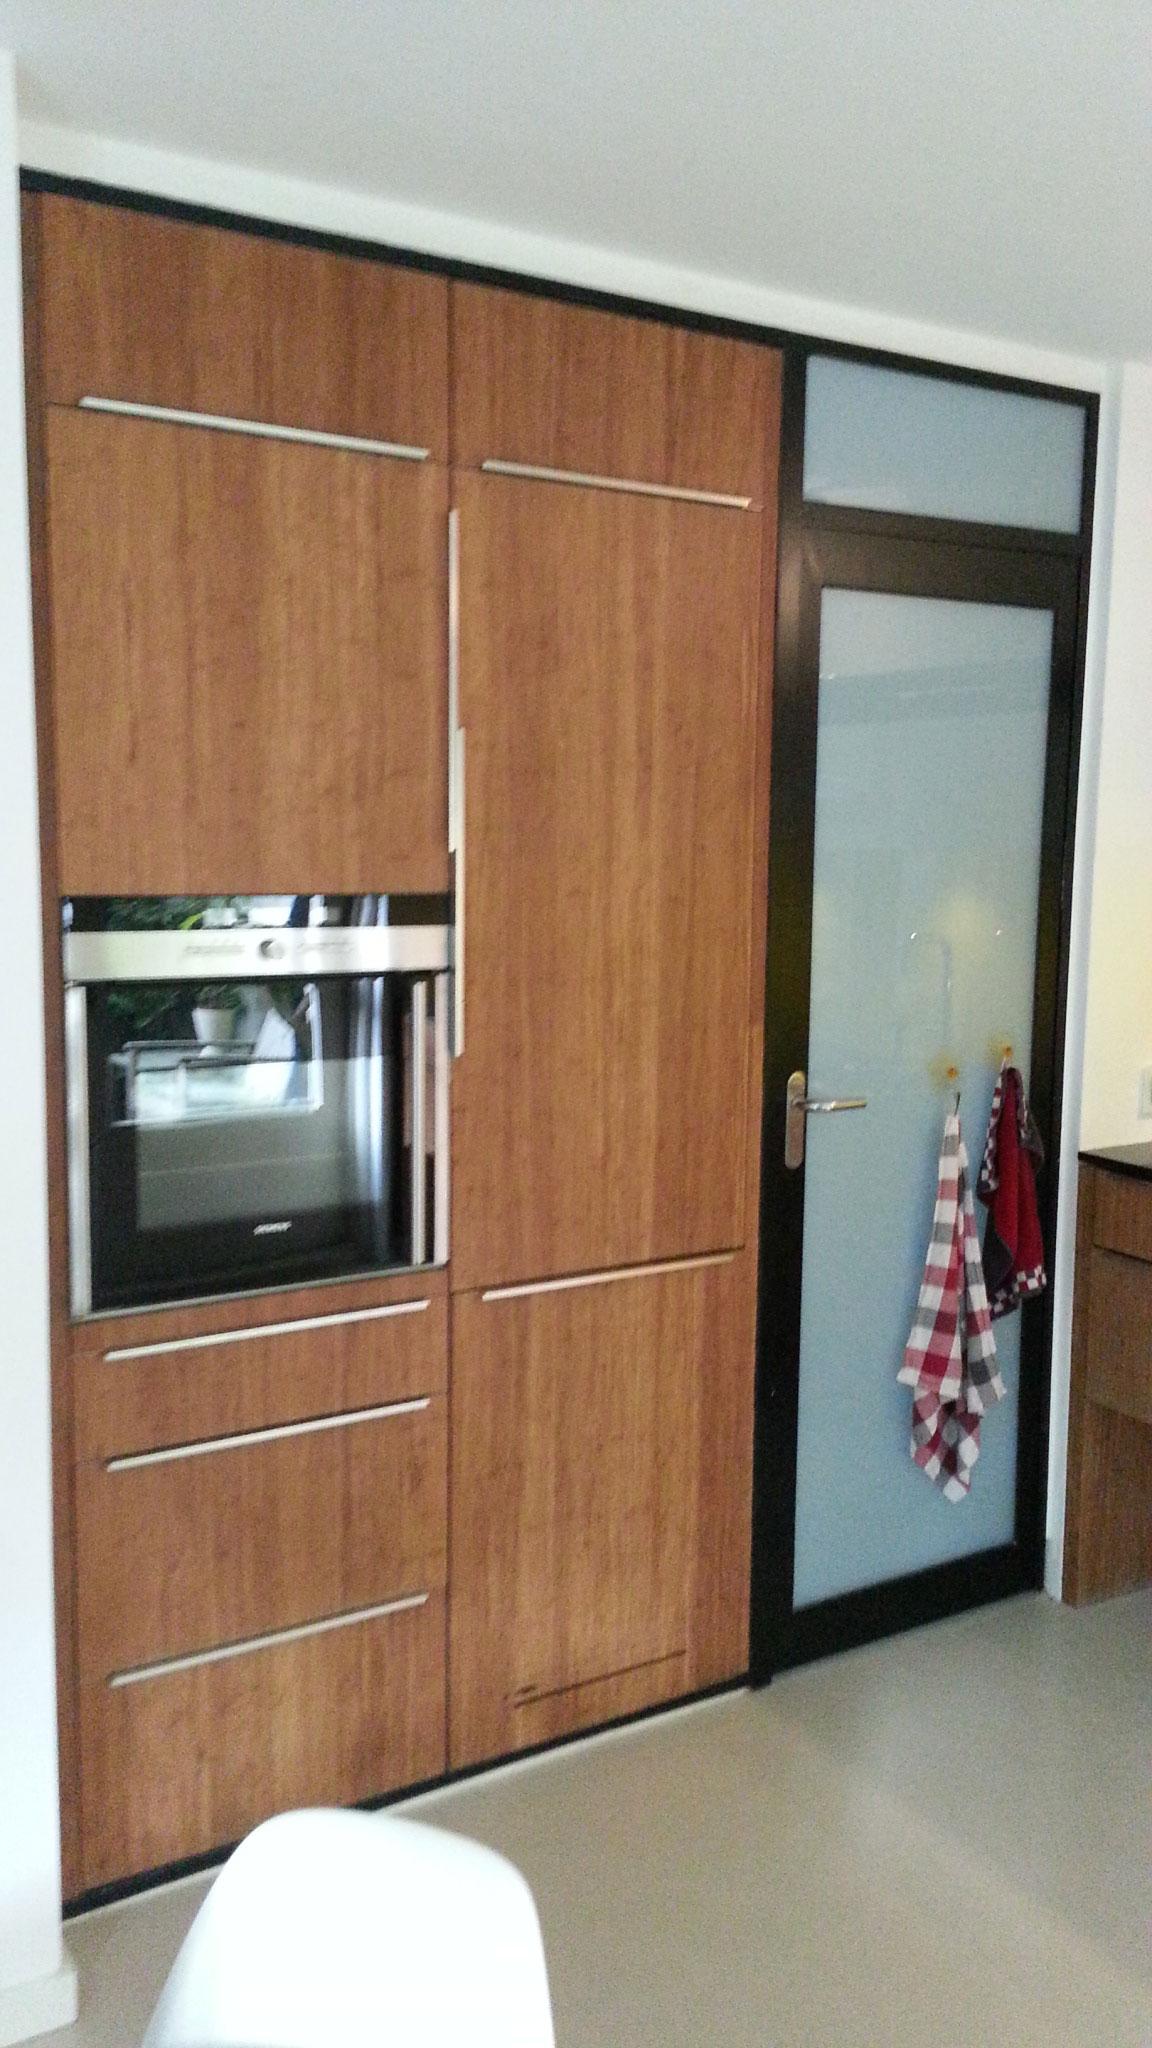 KOSA-bamboo-keuken-deuren.jpg